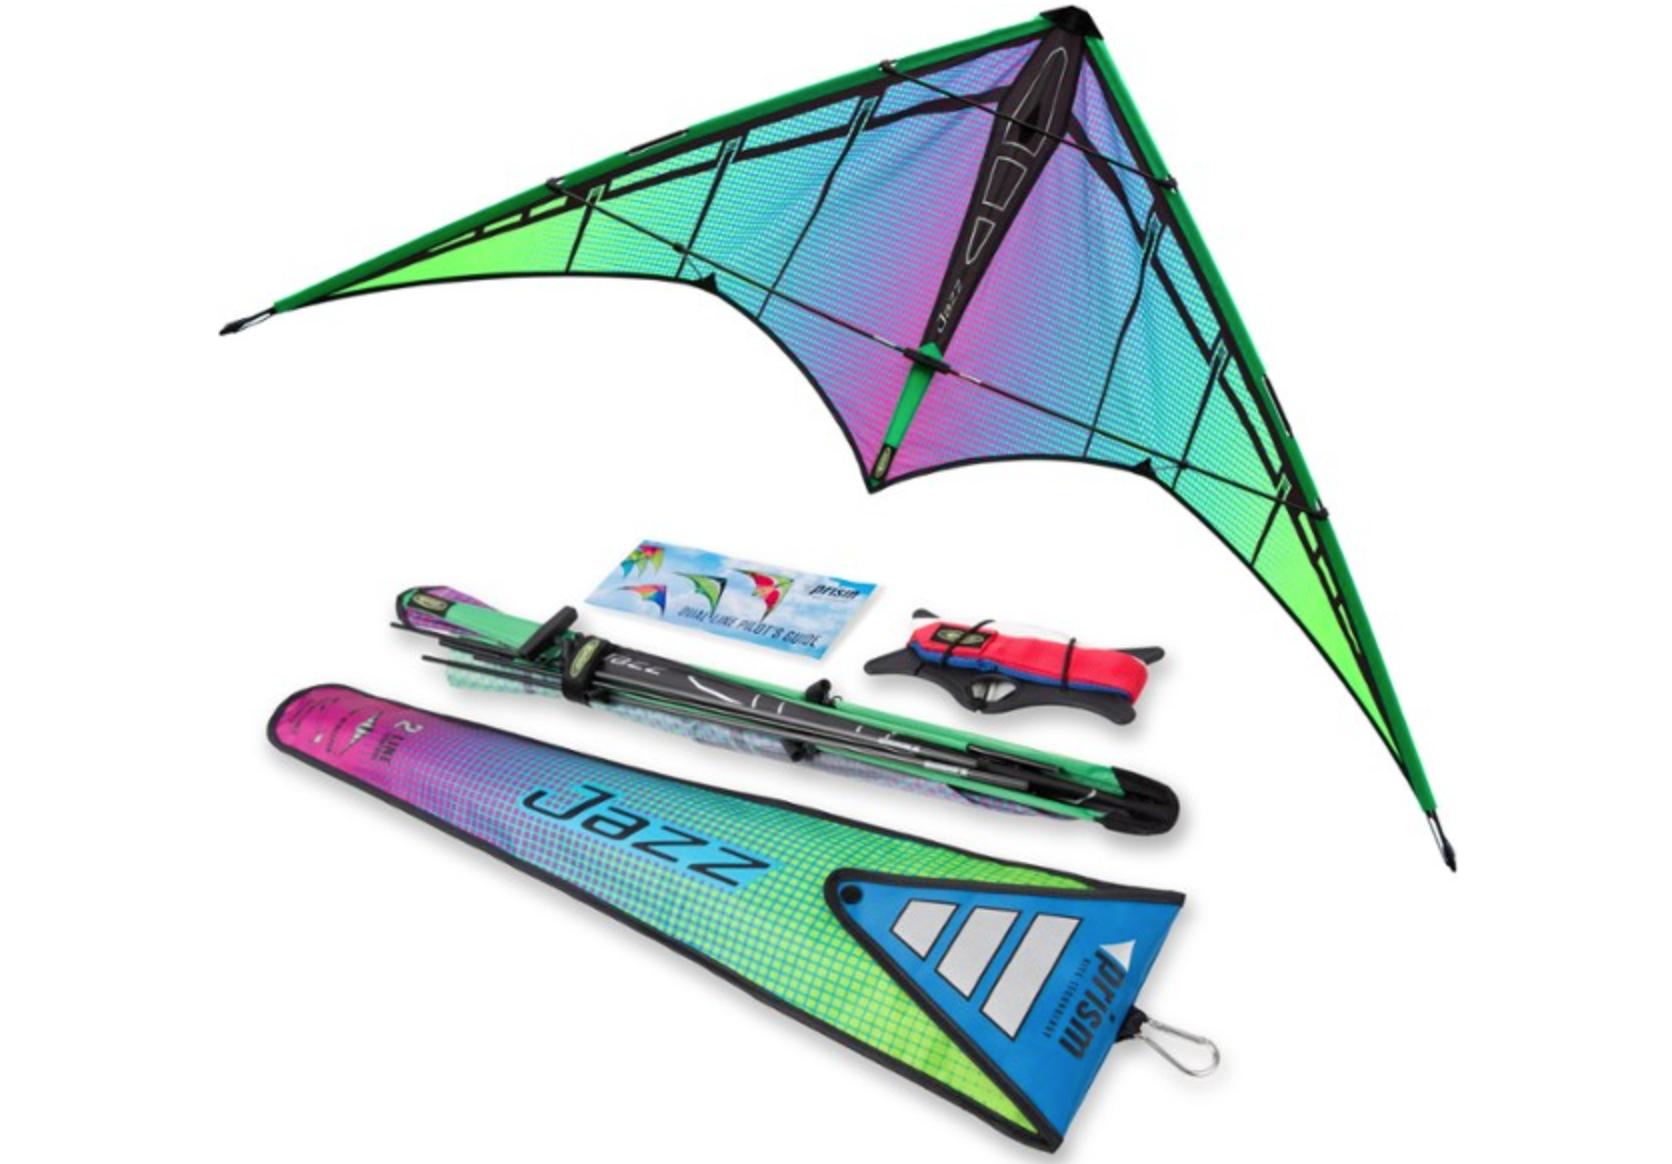 Prism Designs Jazz 2.0 Sport Kite